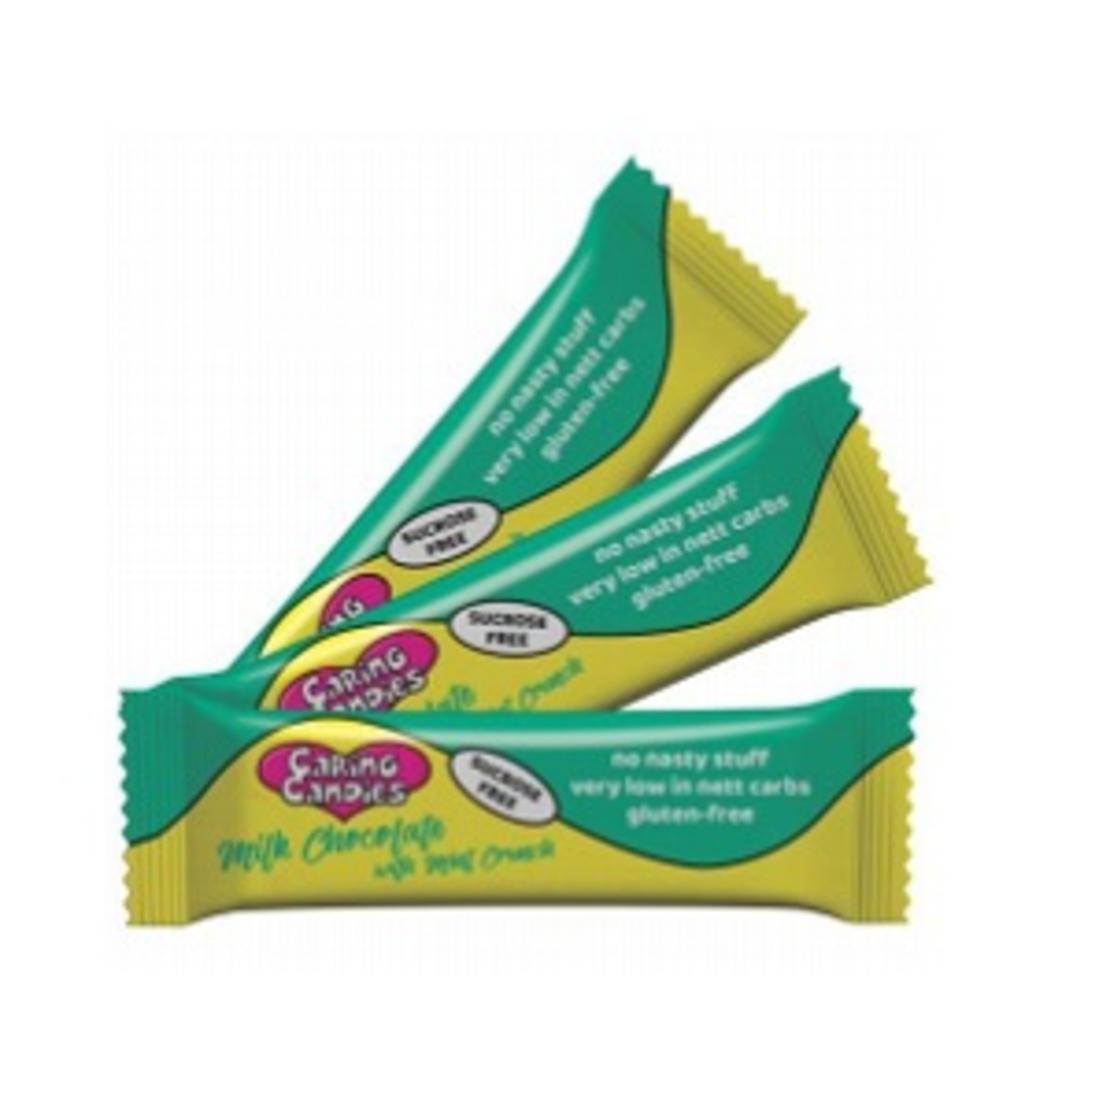 Sugar Free 30% Milk Chocolate with Mint Crunch 50g